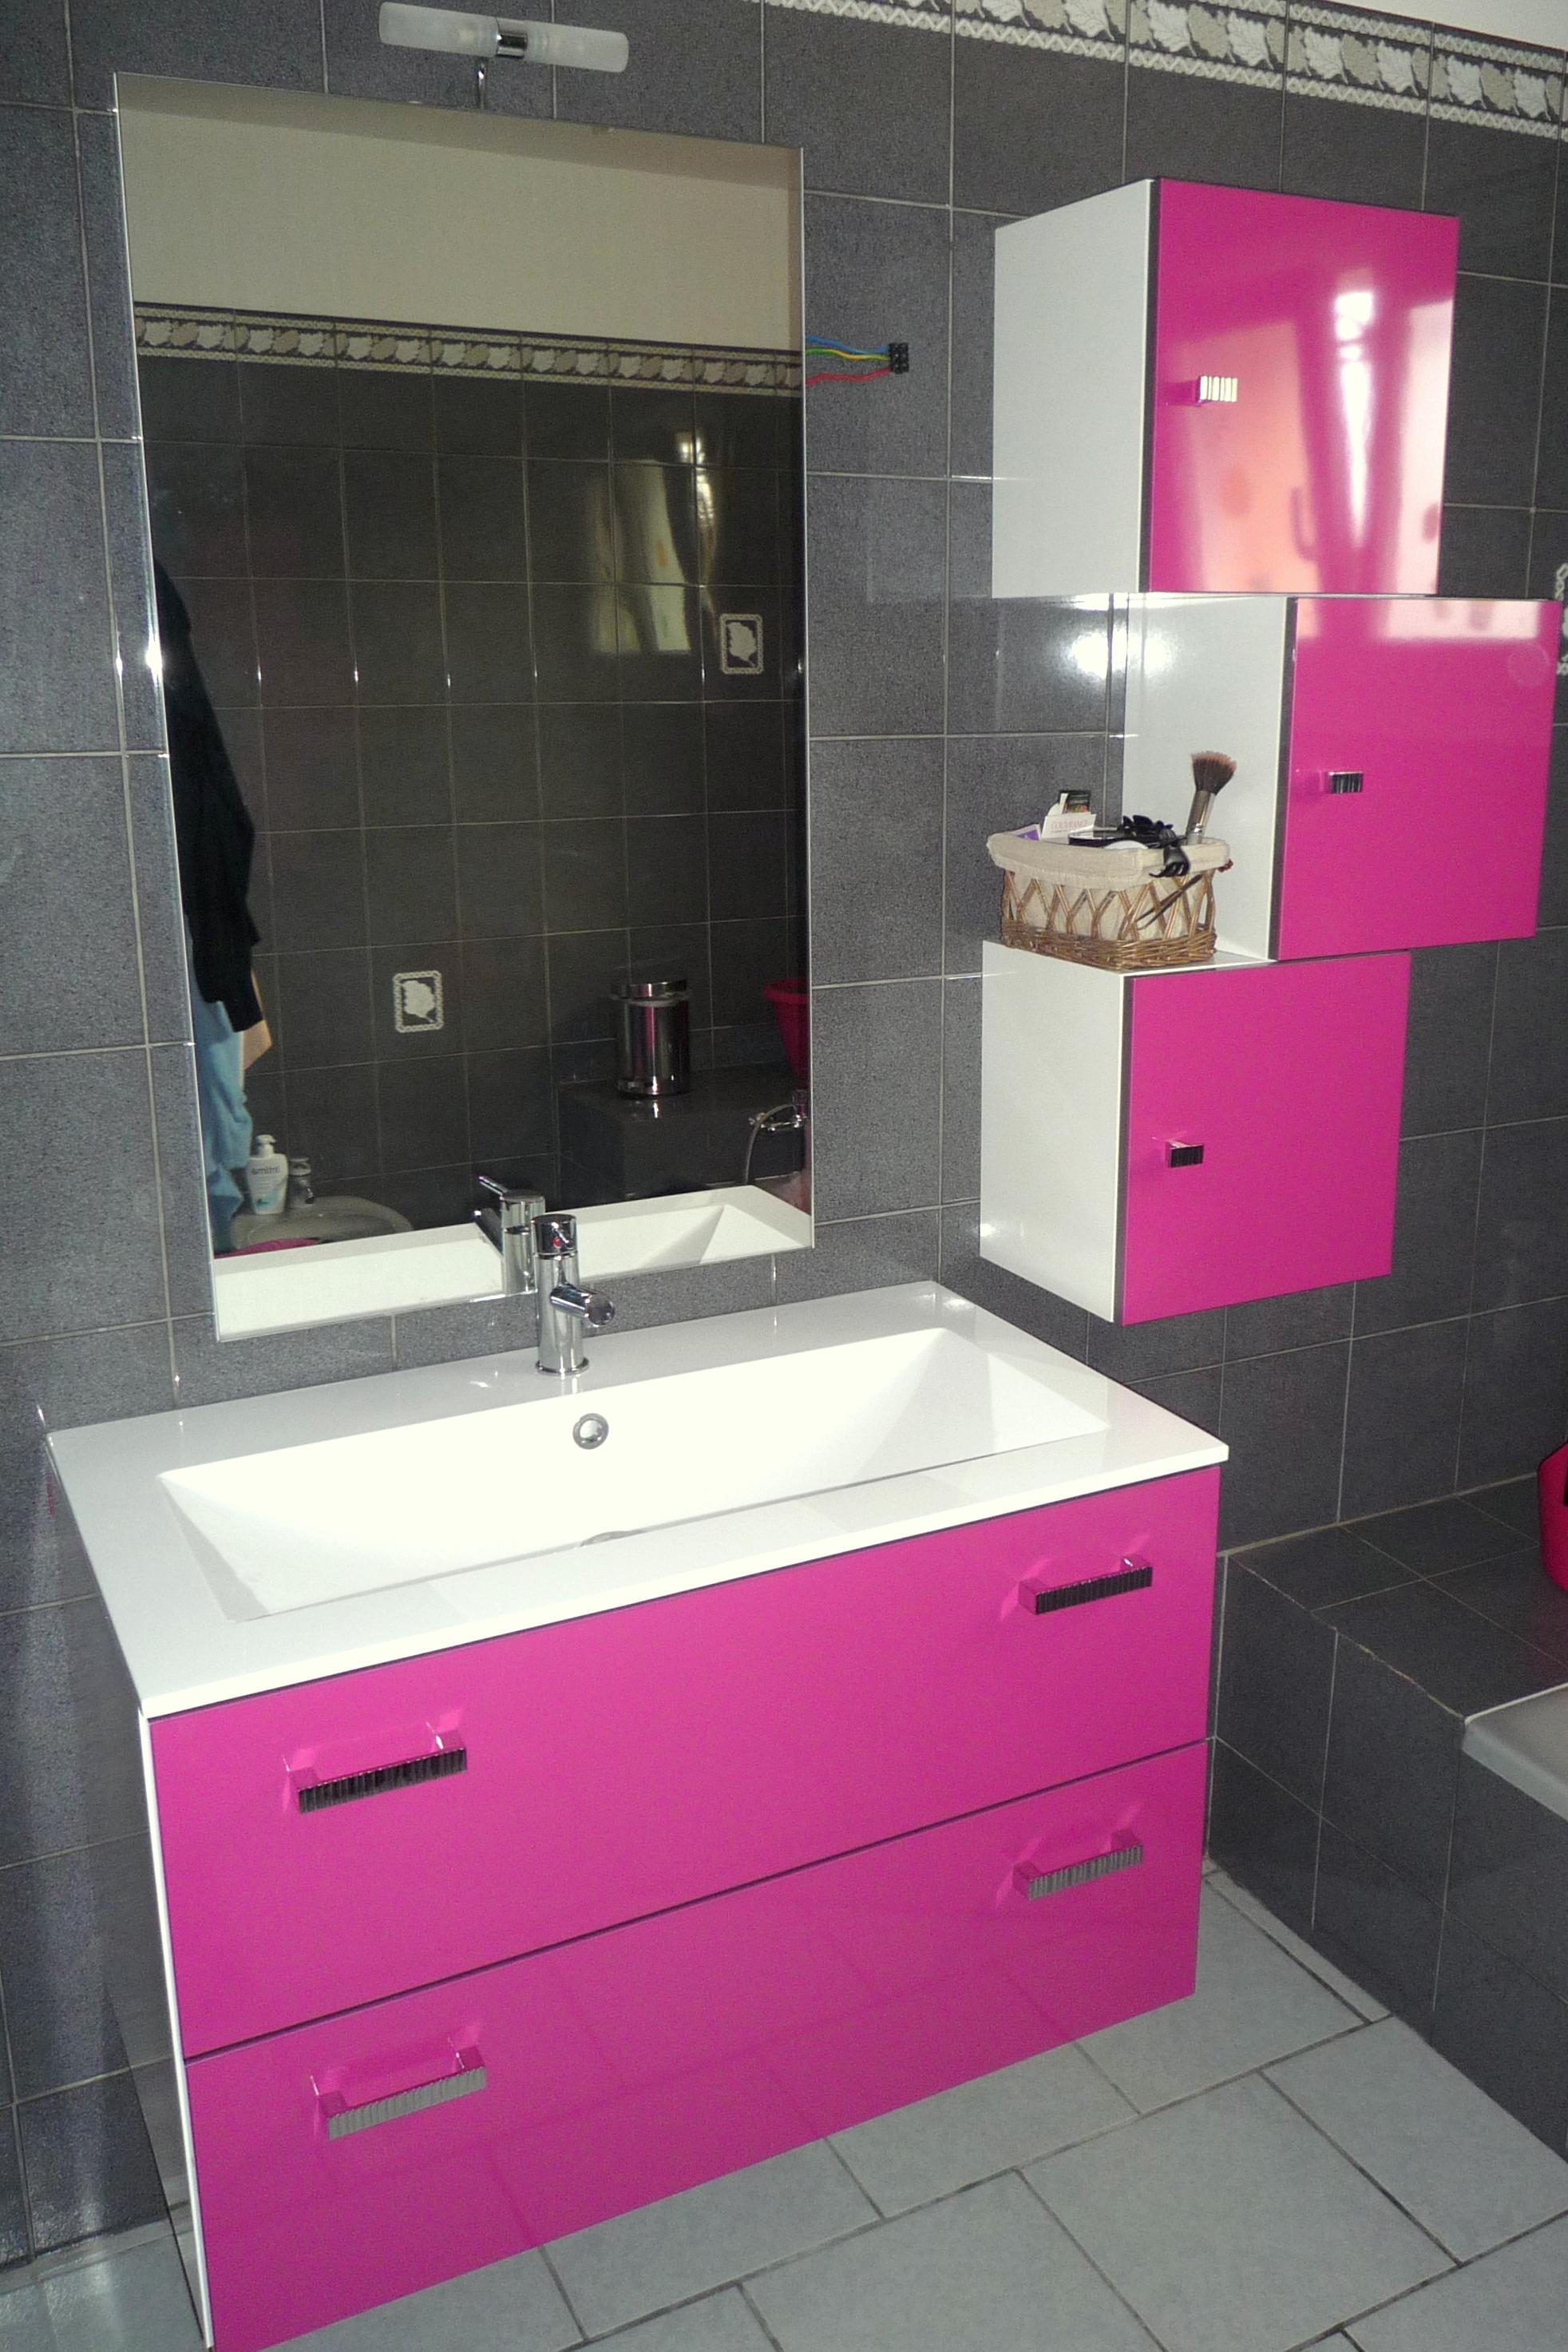 Meuble De Salle De Bain Vasque Miroir Par Cuisine Malrieu